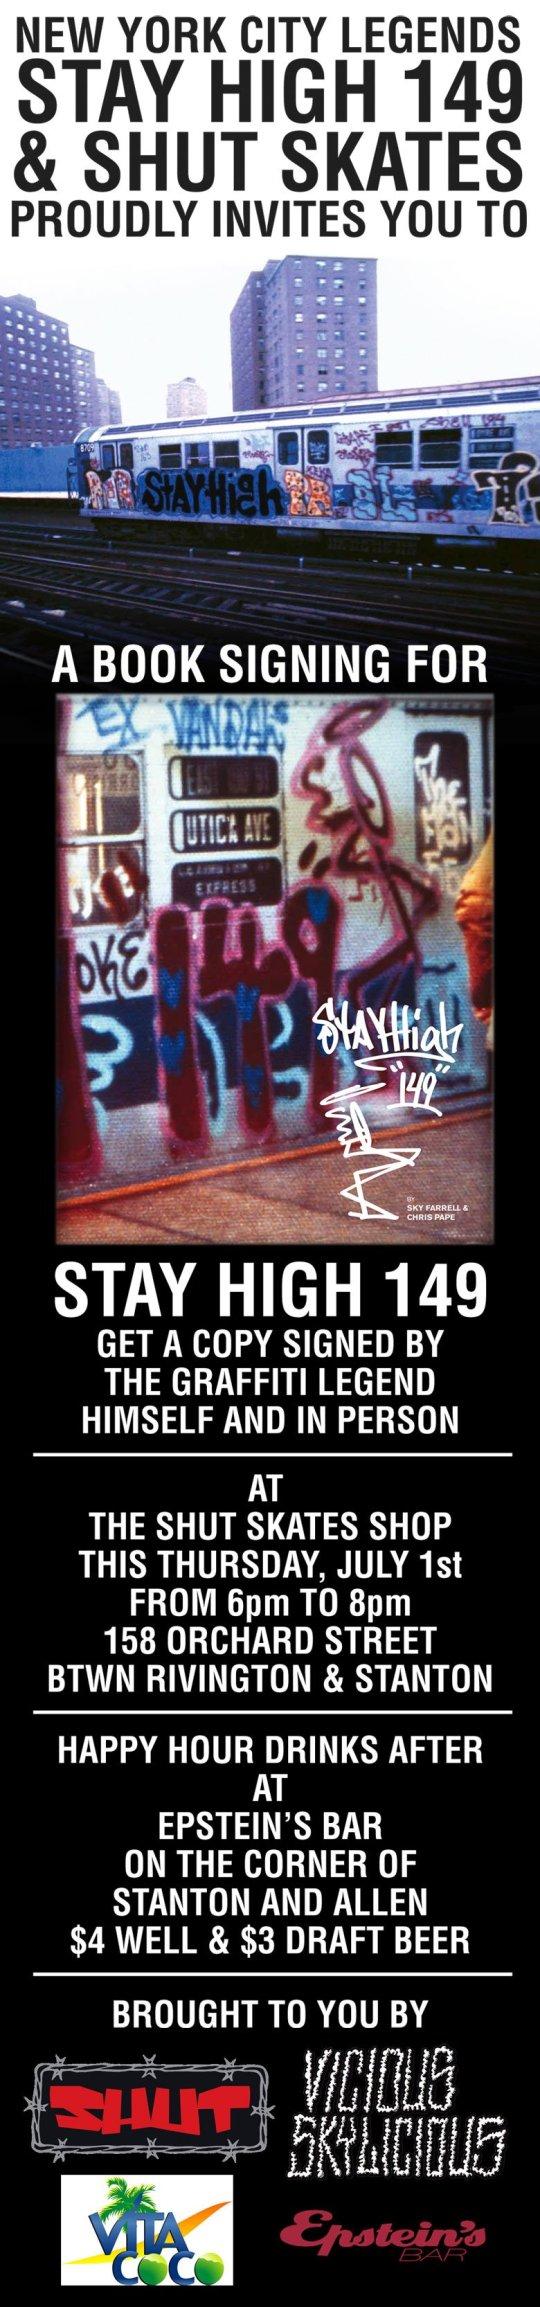 Stay High X Shut